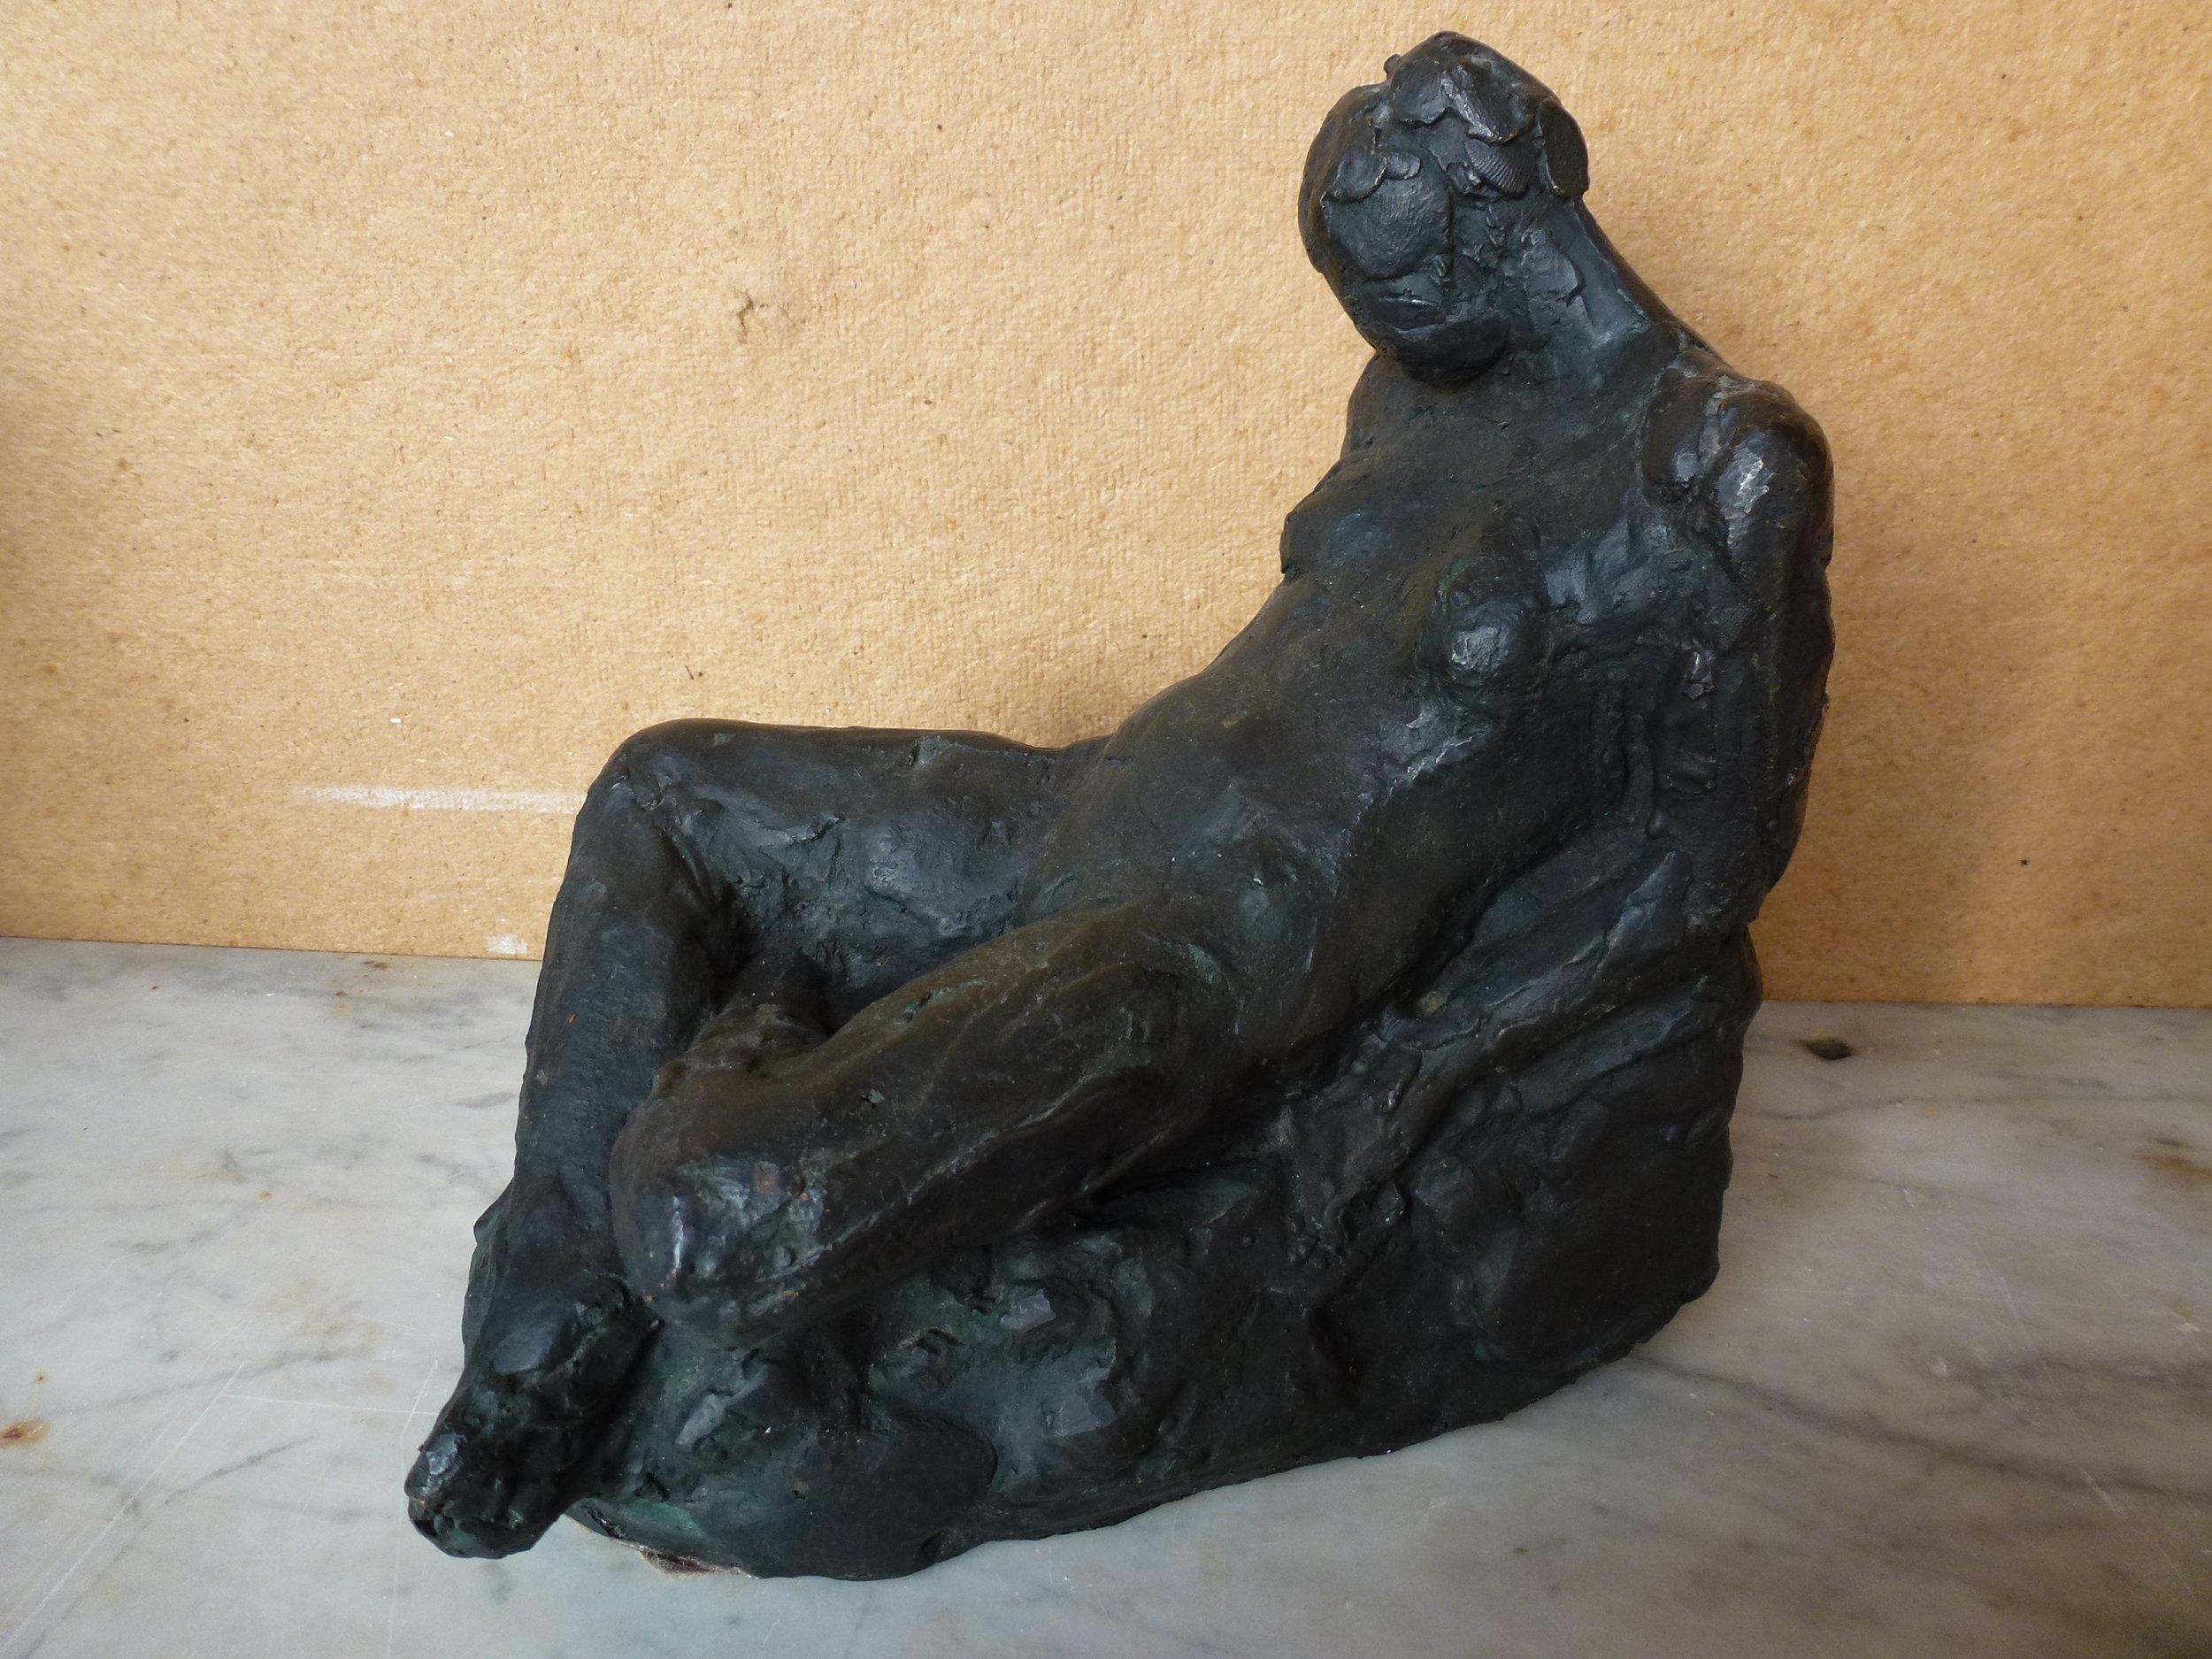 Siddende Bronzefigur kr. 9.500